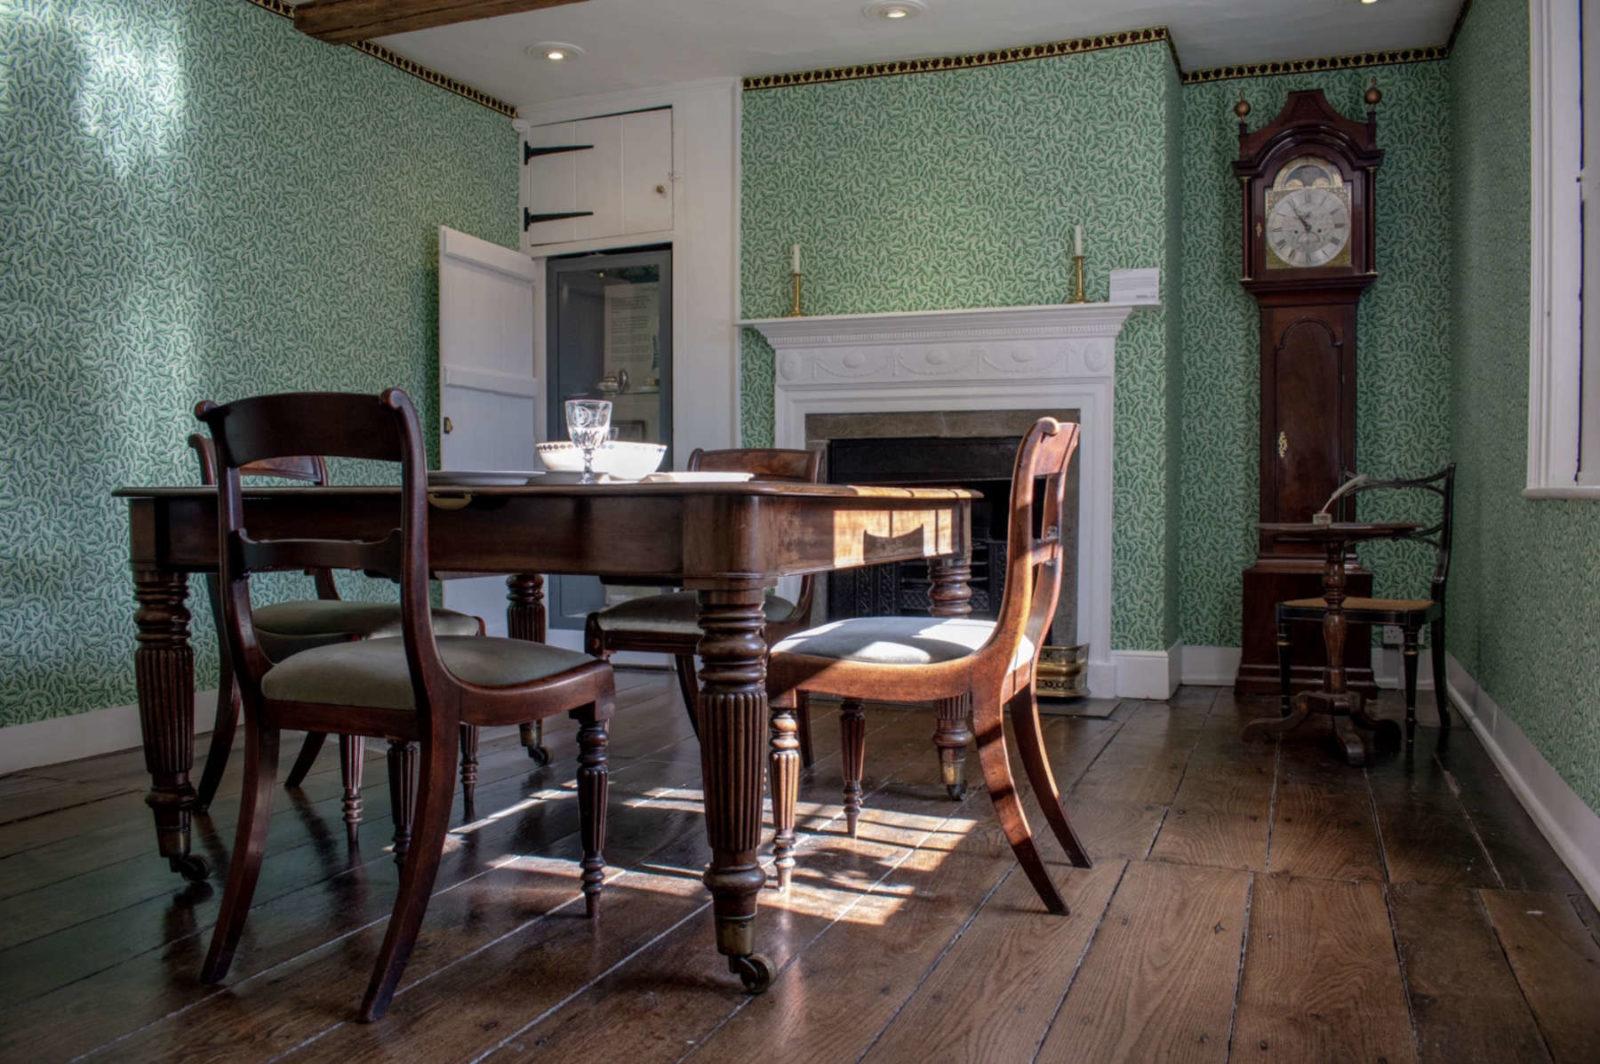 Jane Austen's Dining Room